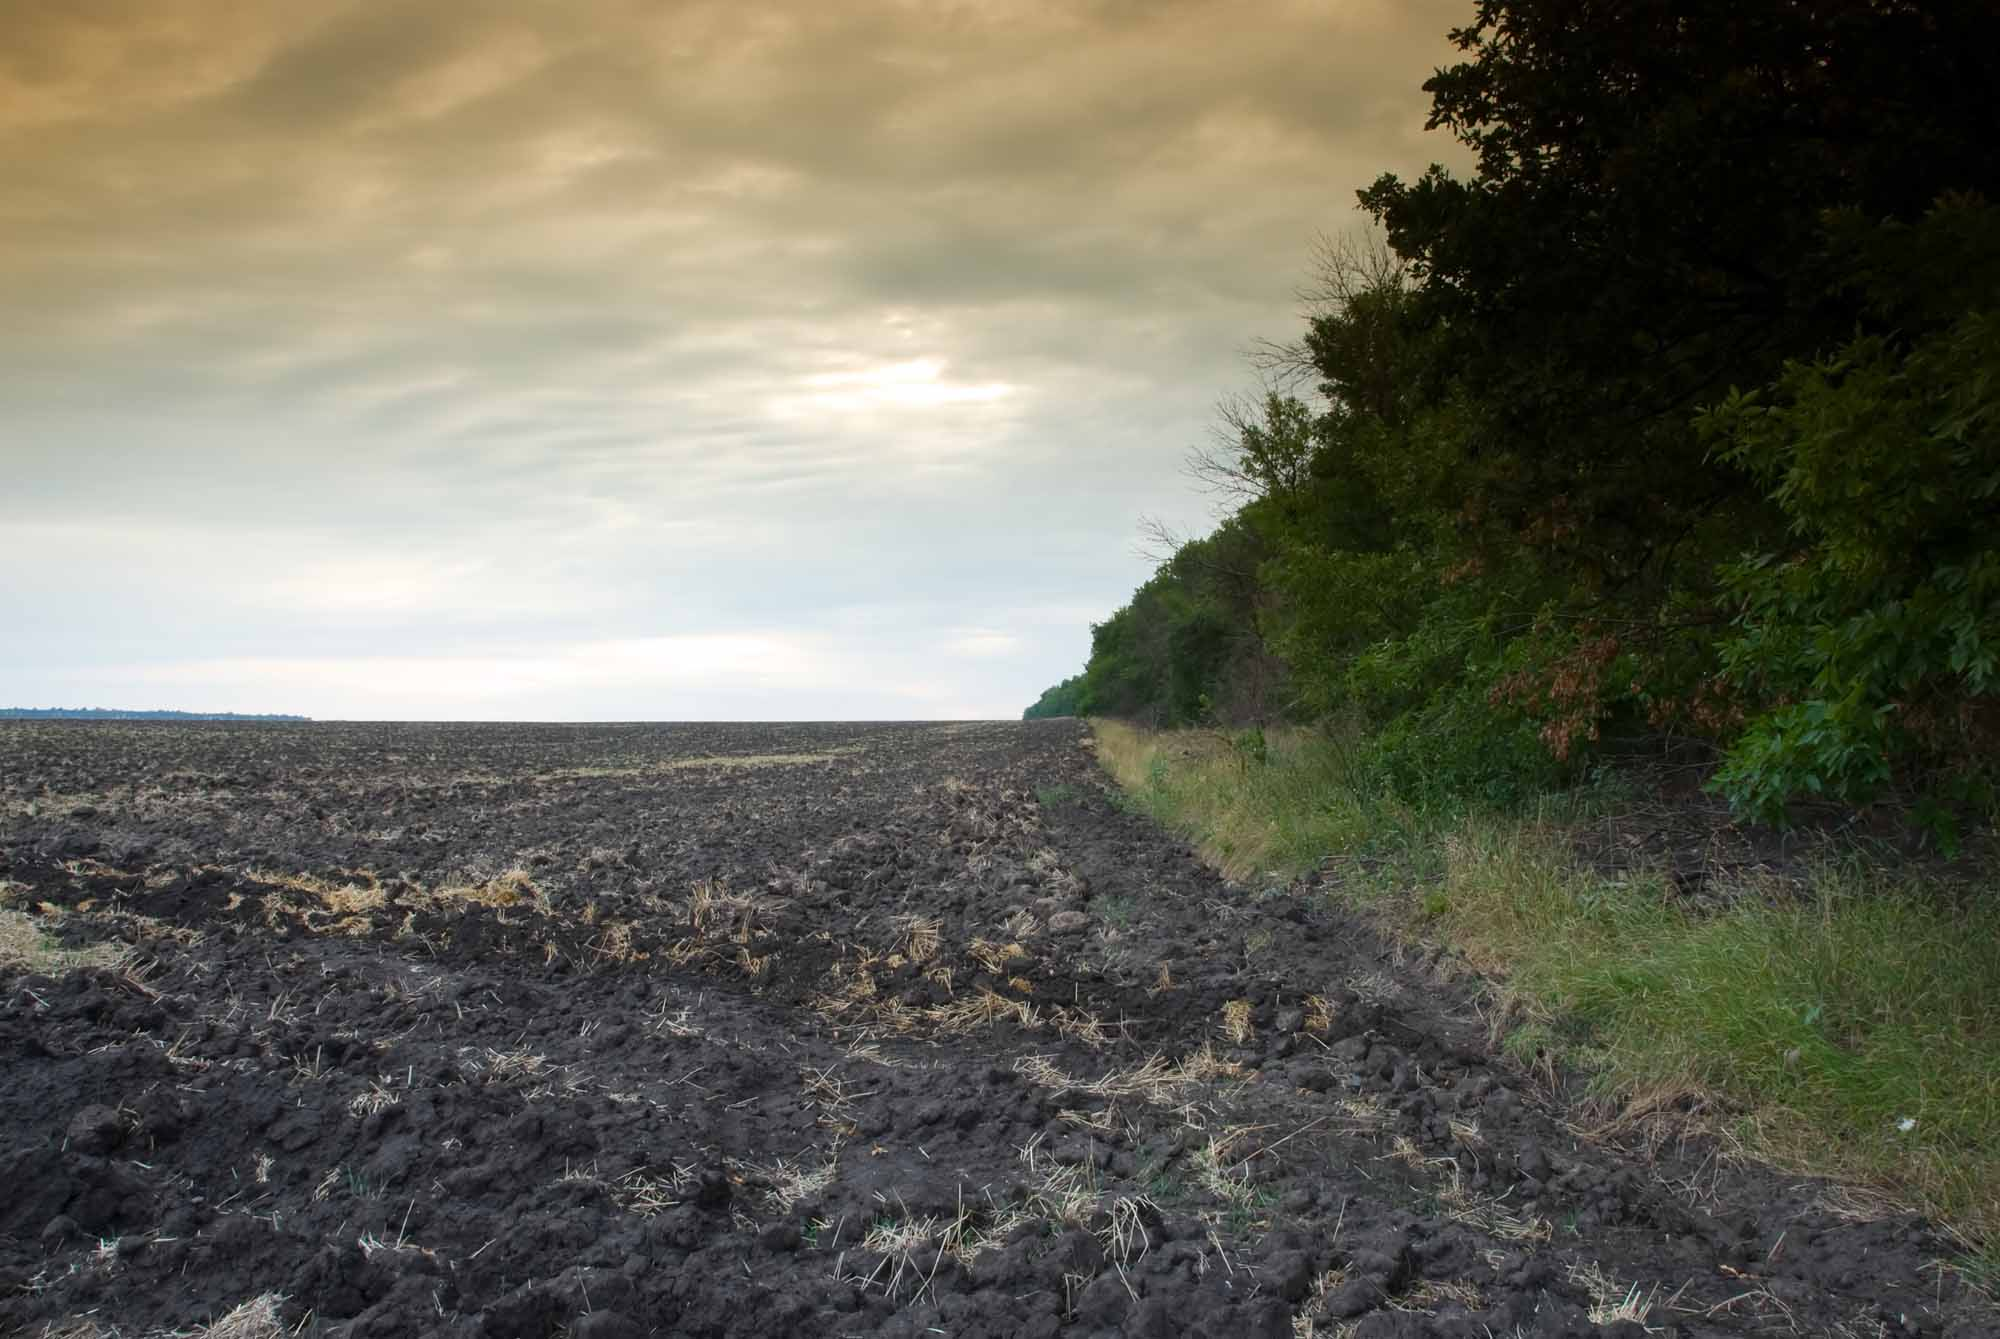 Fallow farming field